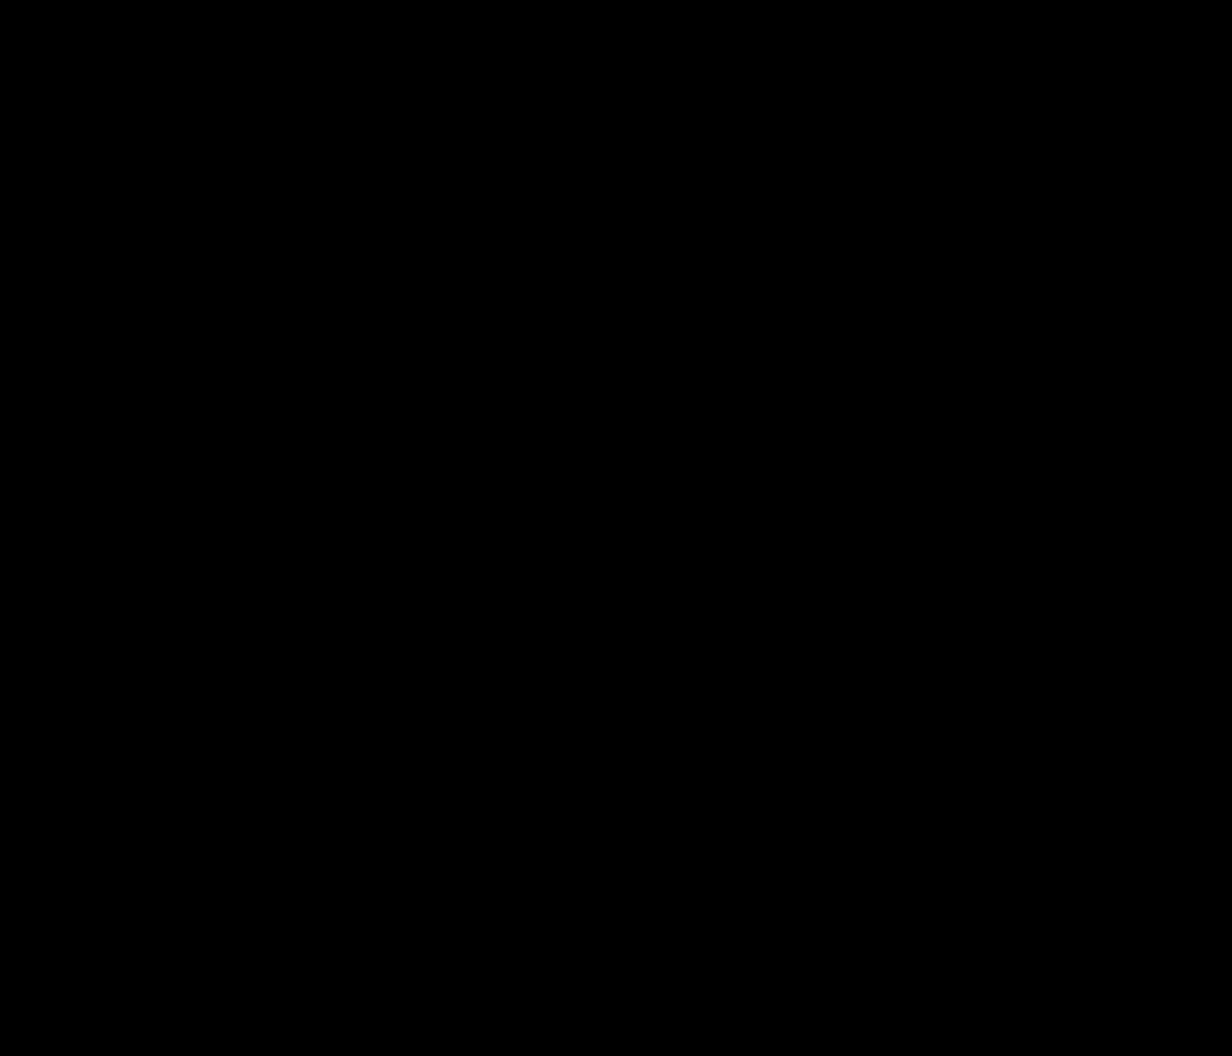 Chicago Dog 42 logo